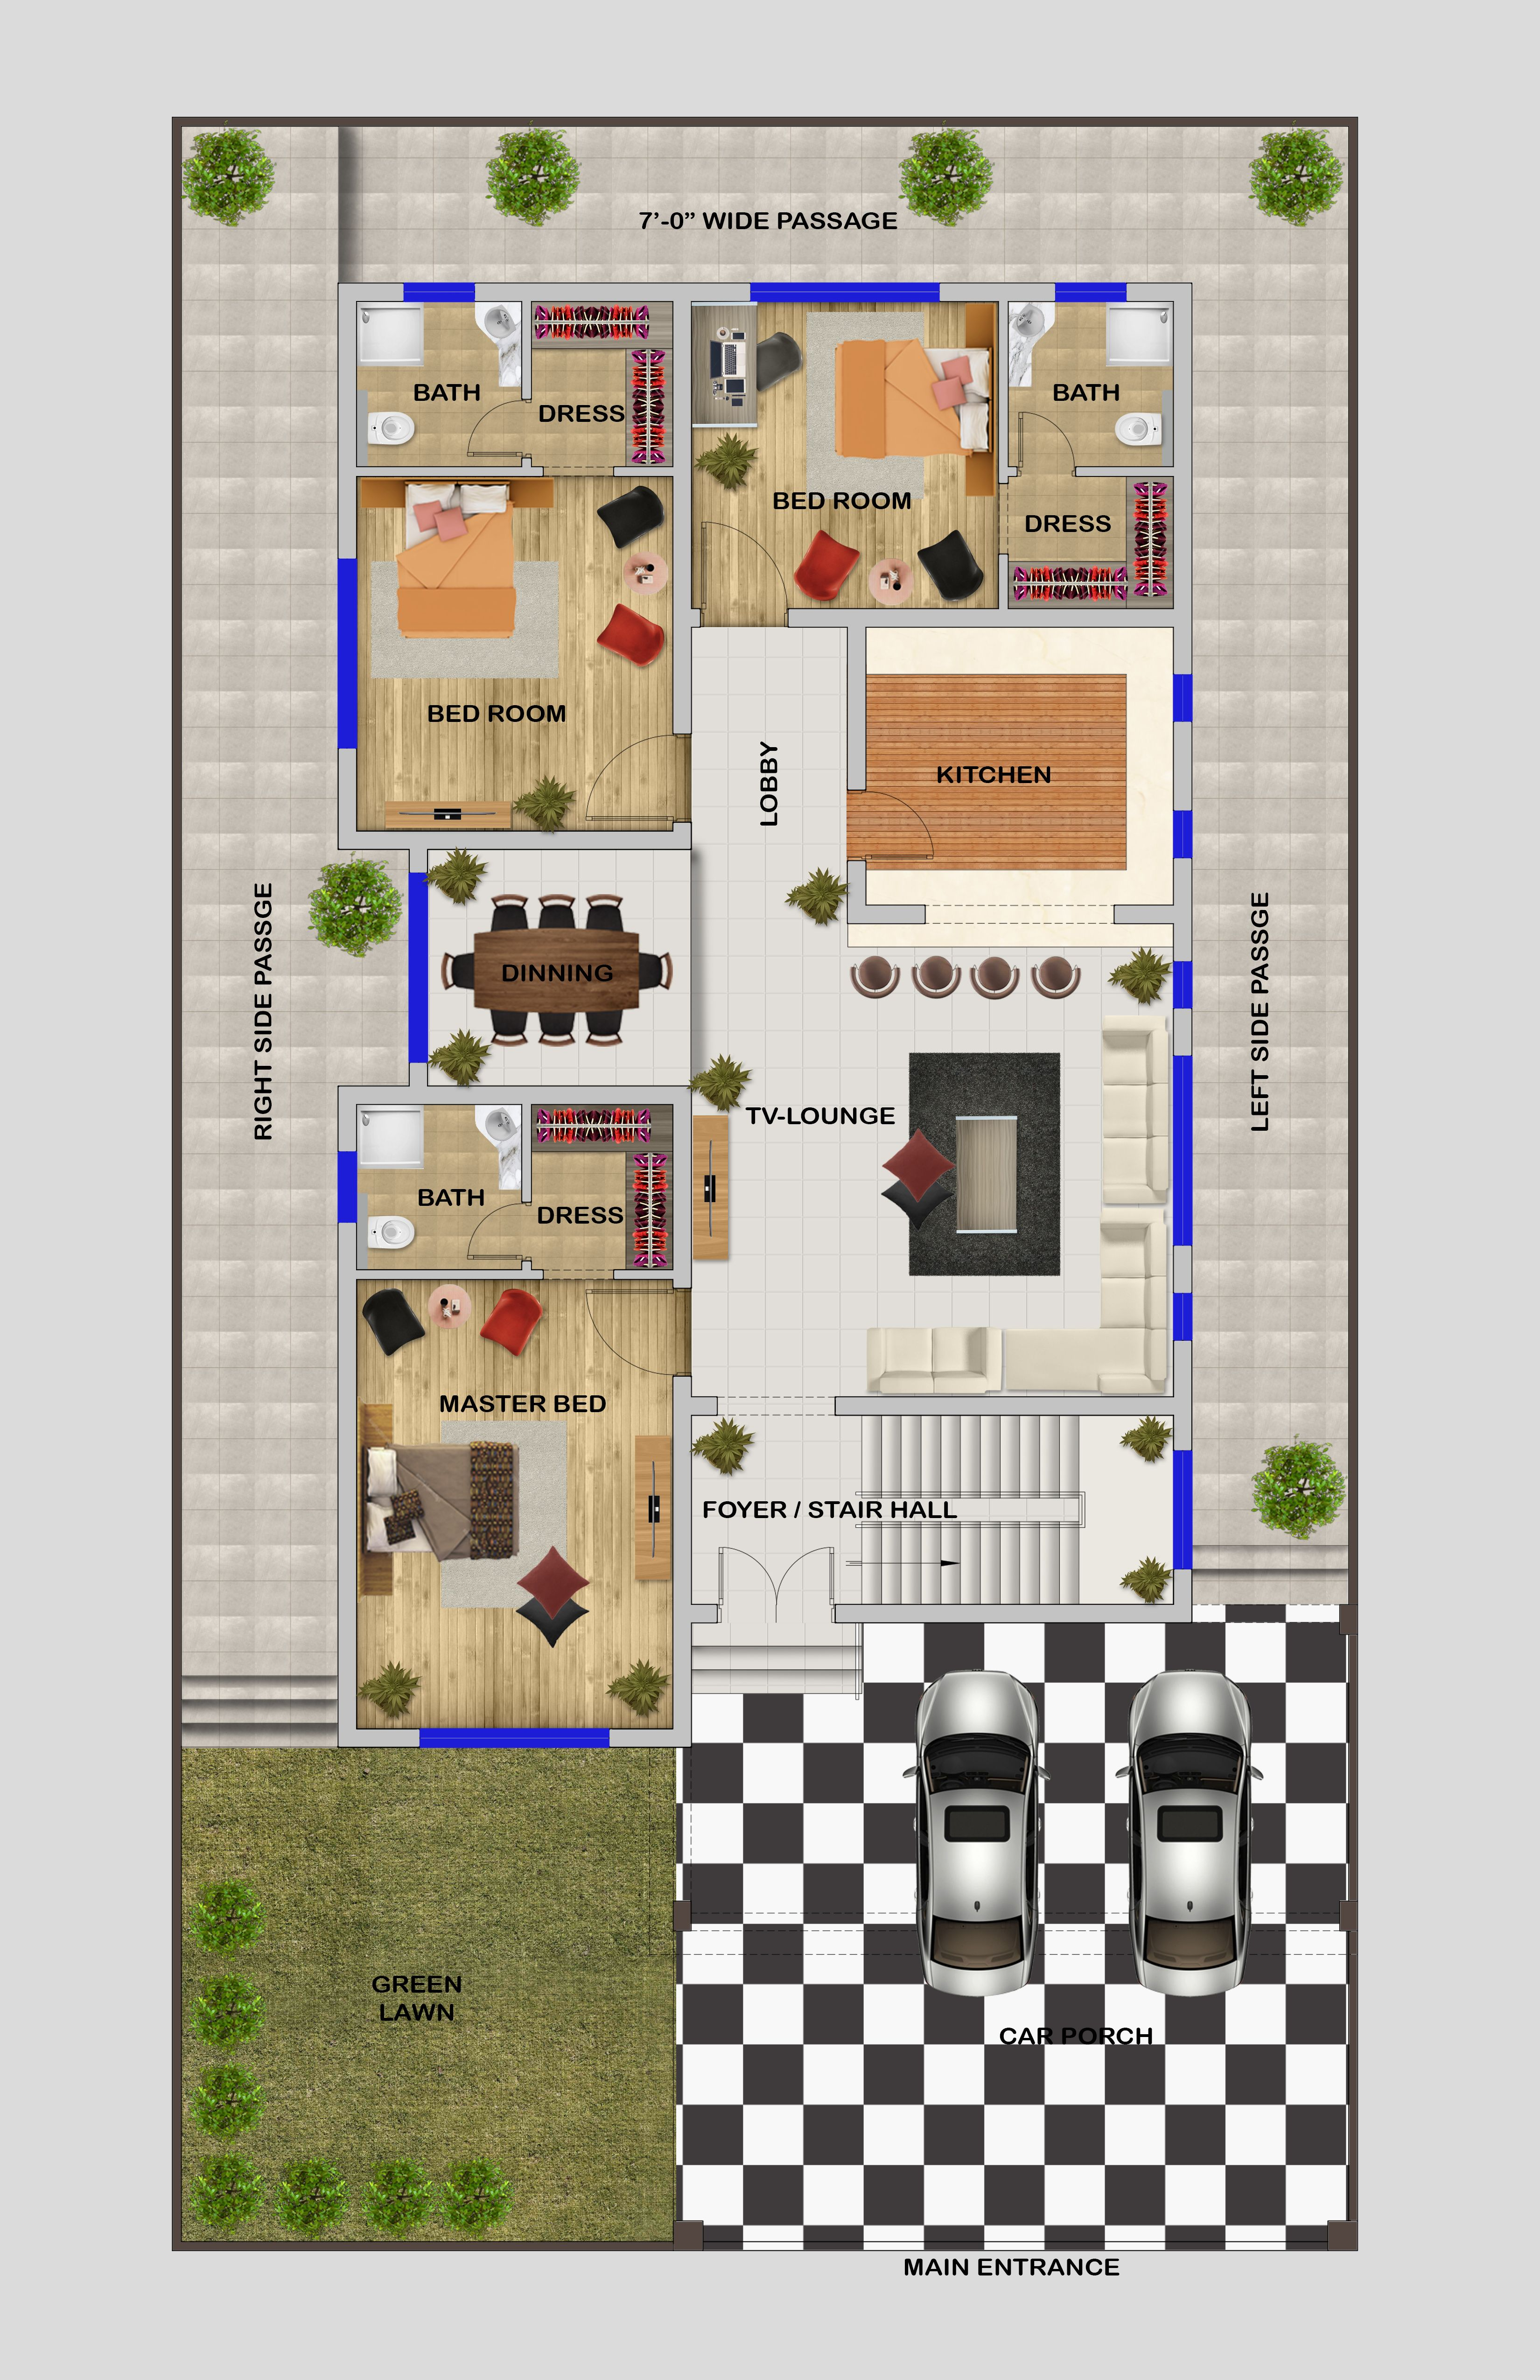 Architectural Ground Floor Plan In Autocad 2014 And Make A Floor Plan Design In Photoshop Cs6 Floor Plan Design Floor Plans Plan Design